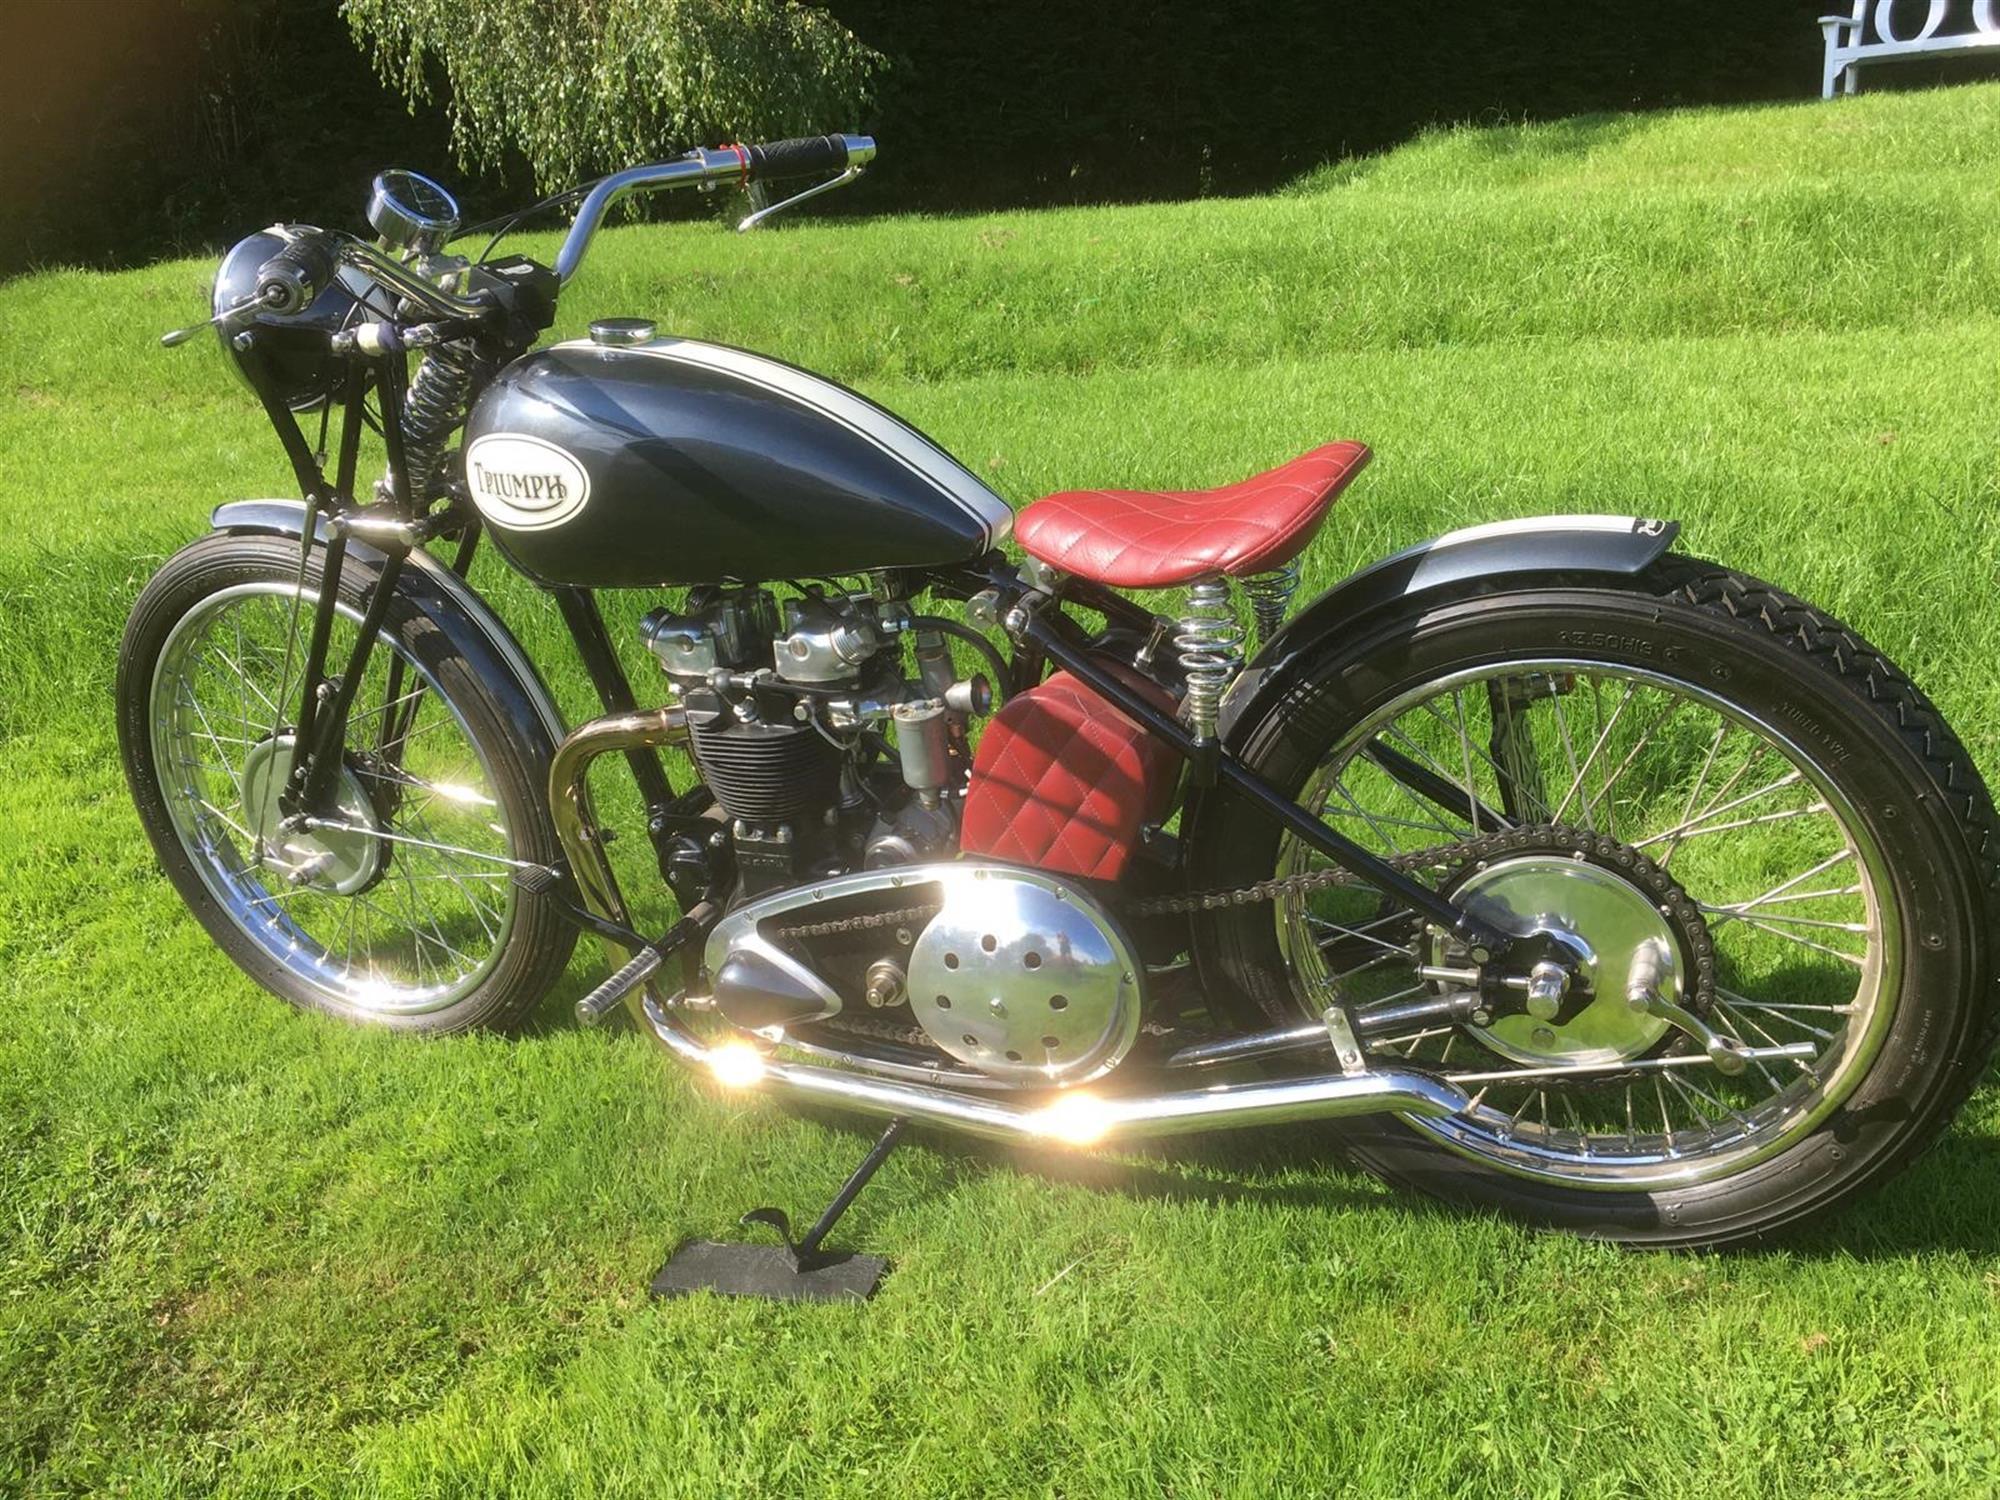 1952 Purdy Triumph 500 - Image 9 of 10